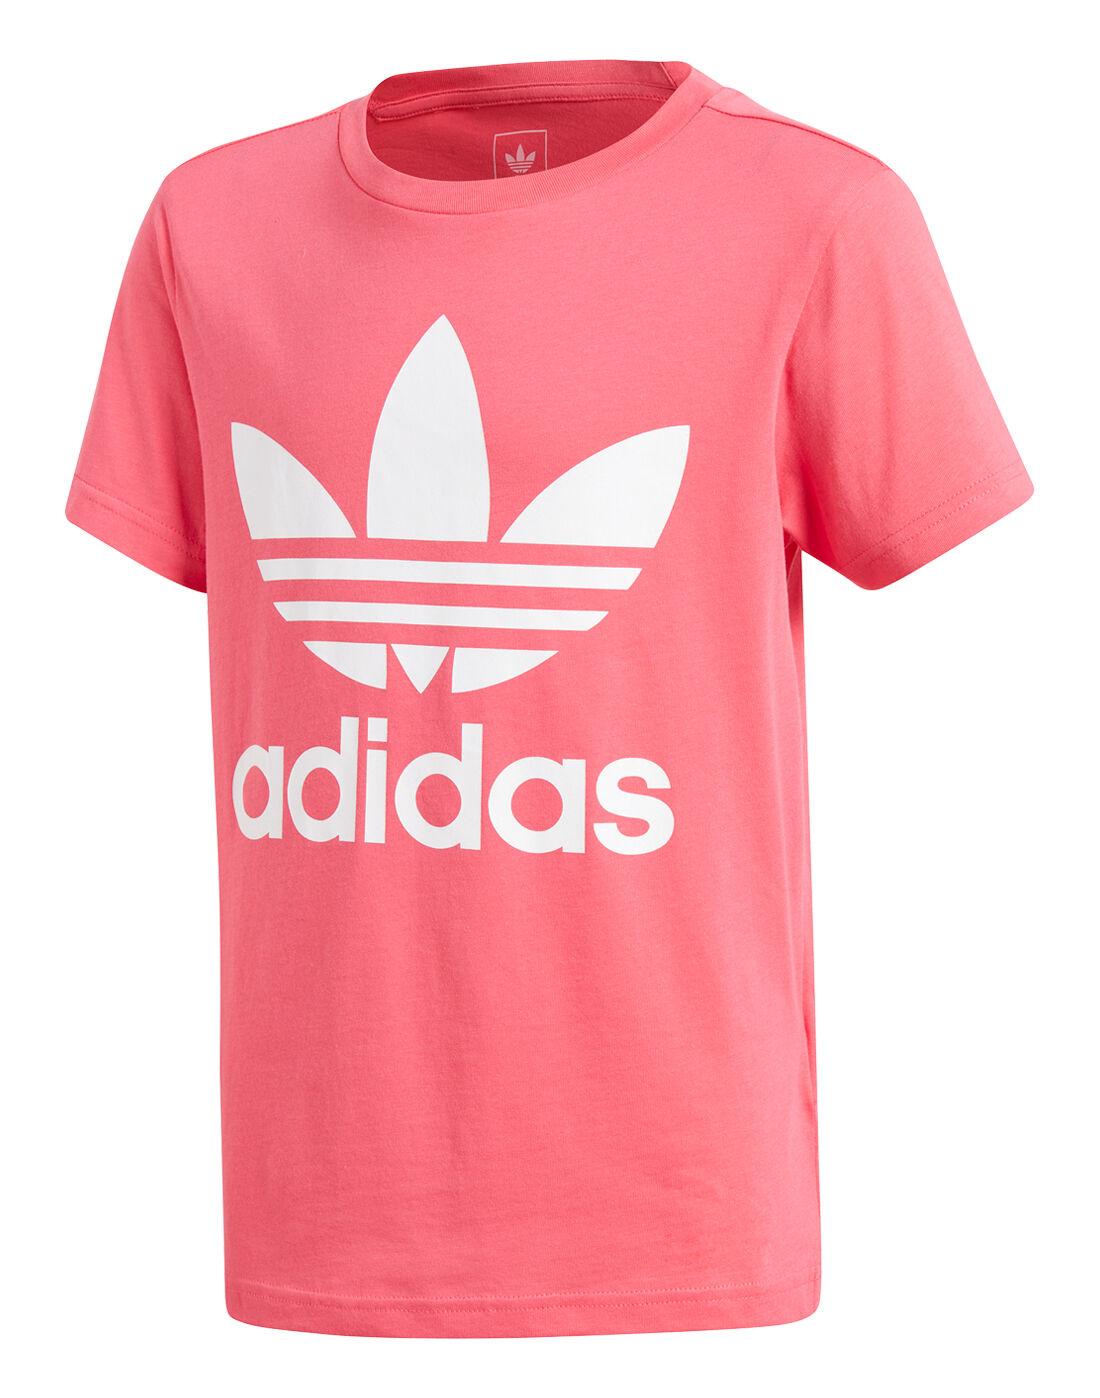 Older Girls adidas Originals T-Shirt